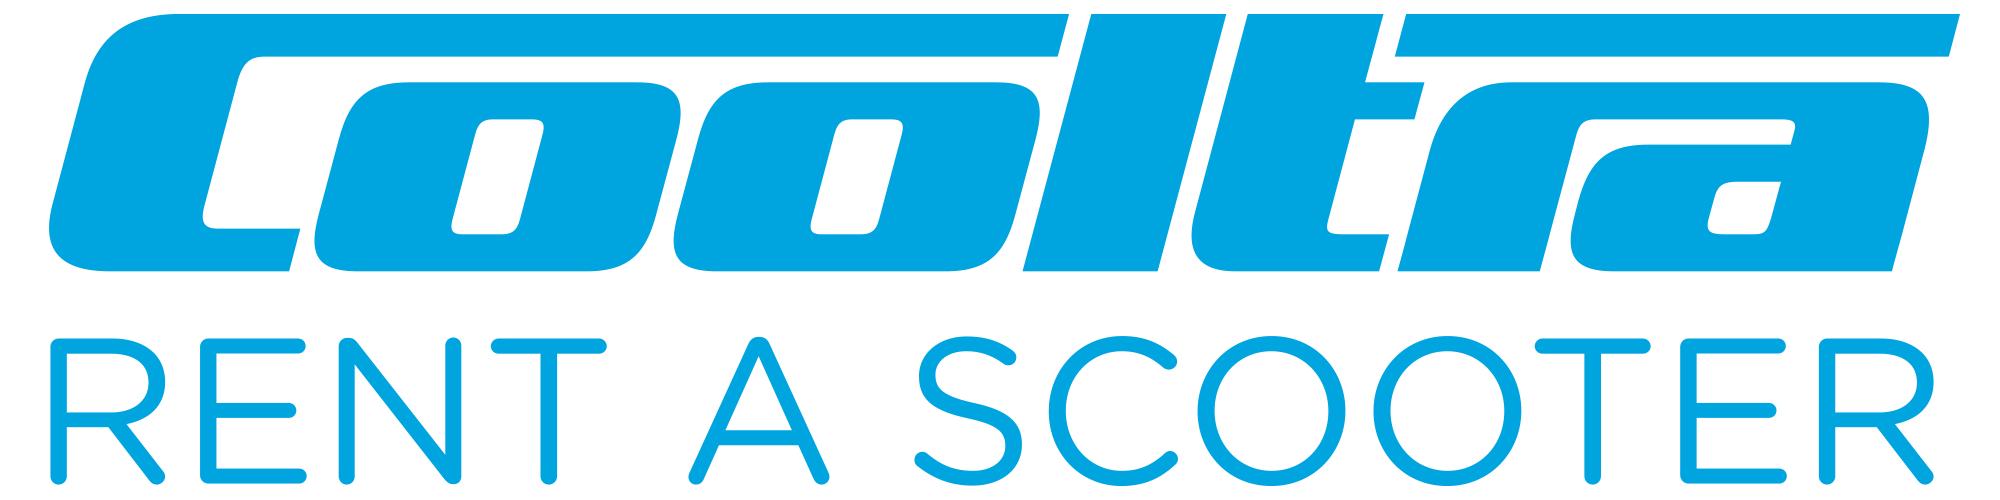 -40% descuento en alquiler de motos en Islas Baleares